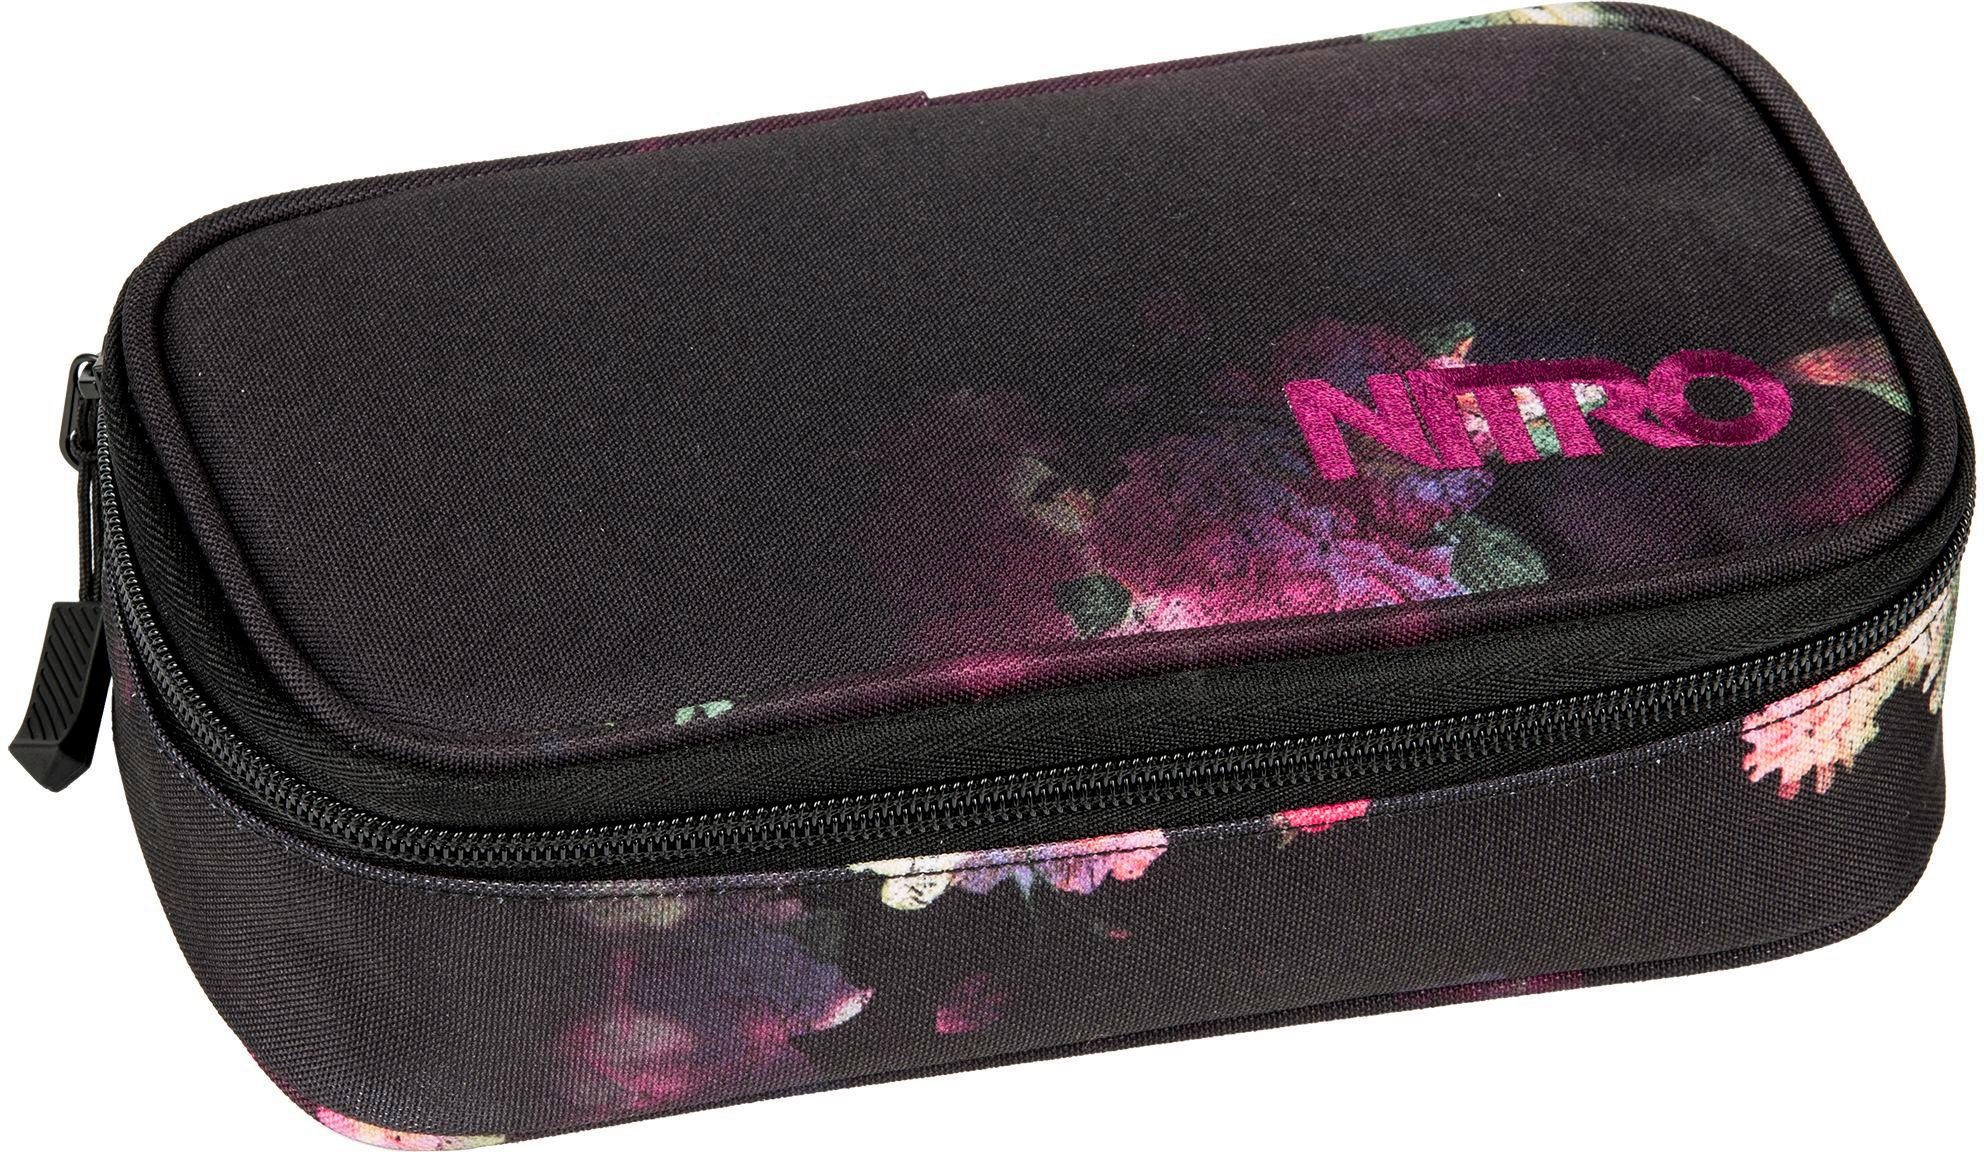 Nitro Federmäppchen, »Pencil Case XL Black Rose«